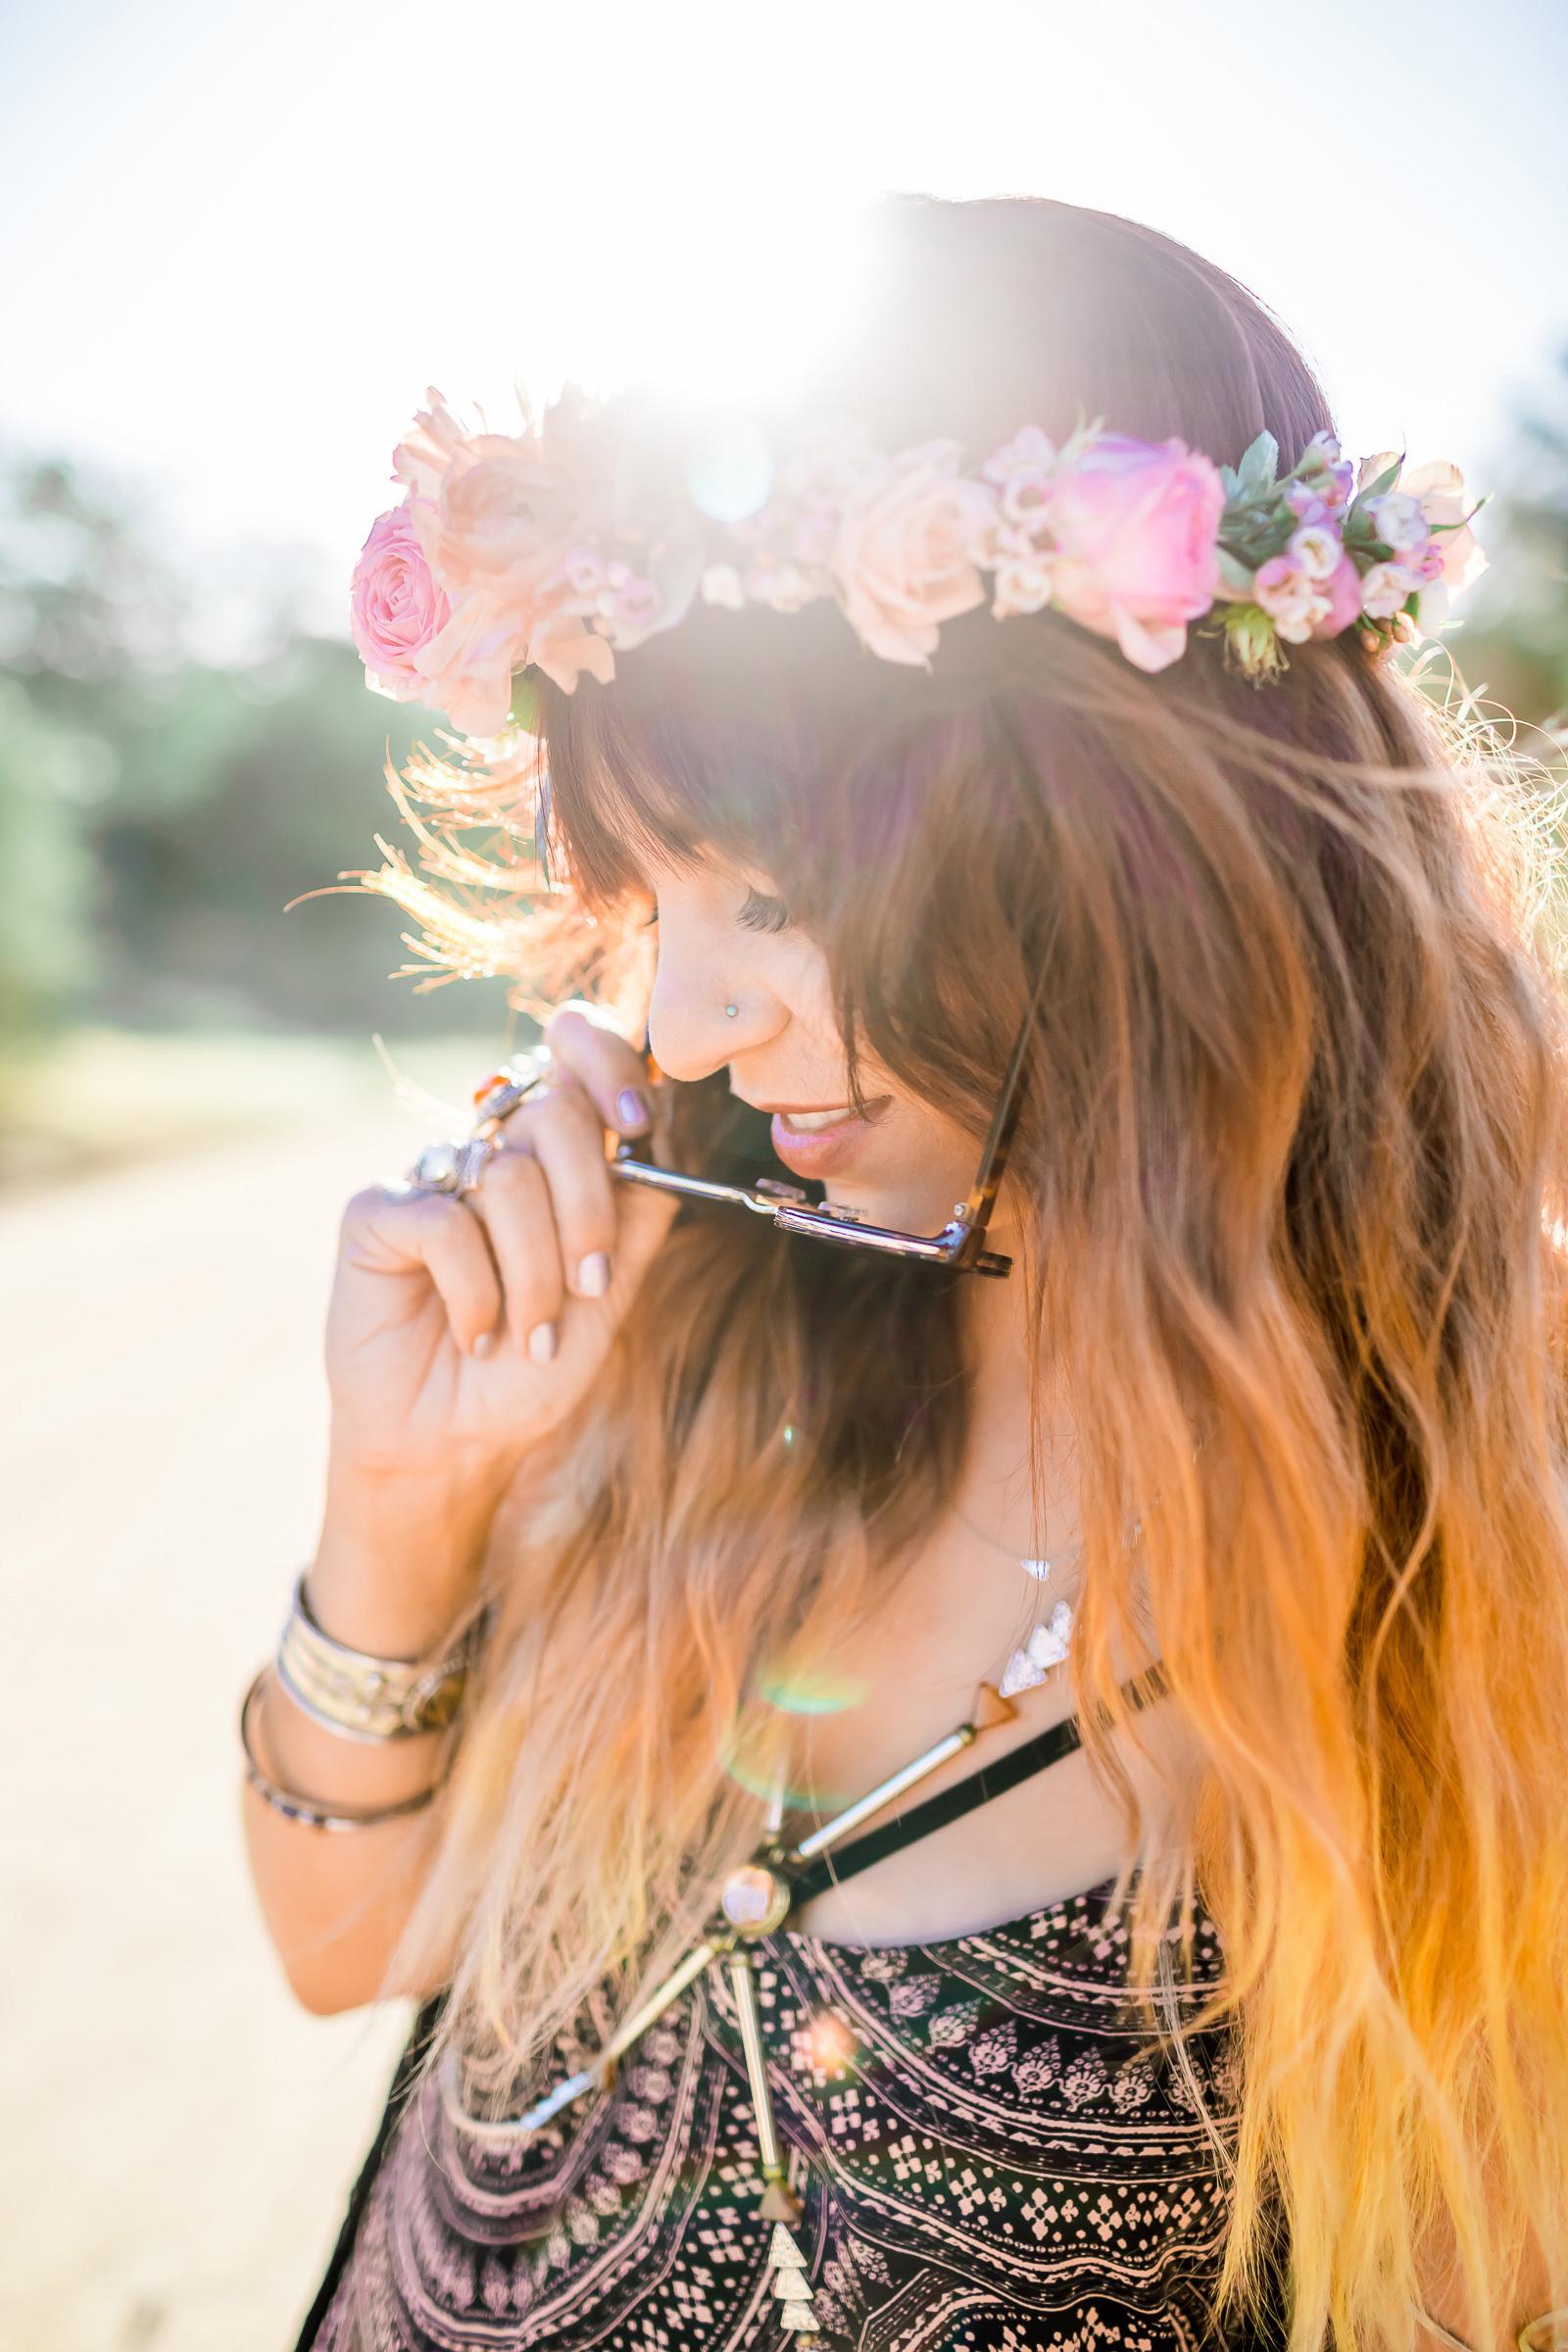 Festival-Stagecoach-Inspiration-Velvet-Sugar-Decorated-Mustang_11.jpg